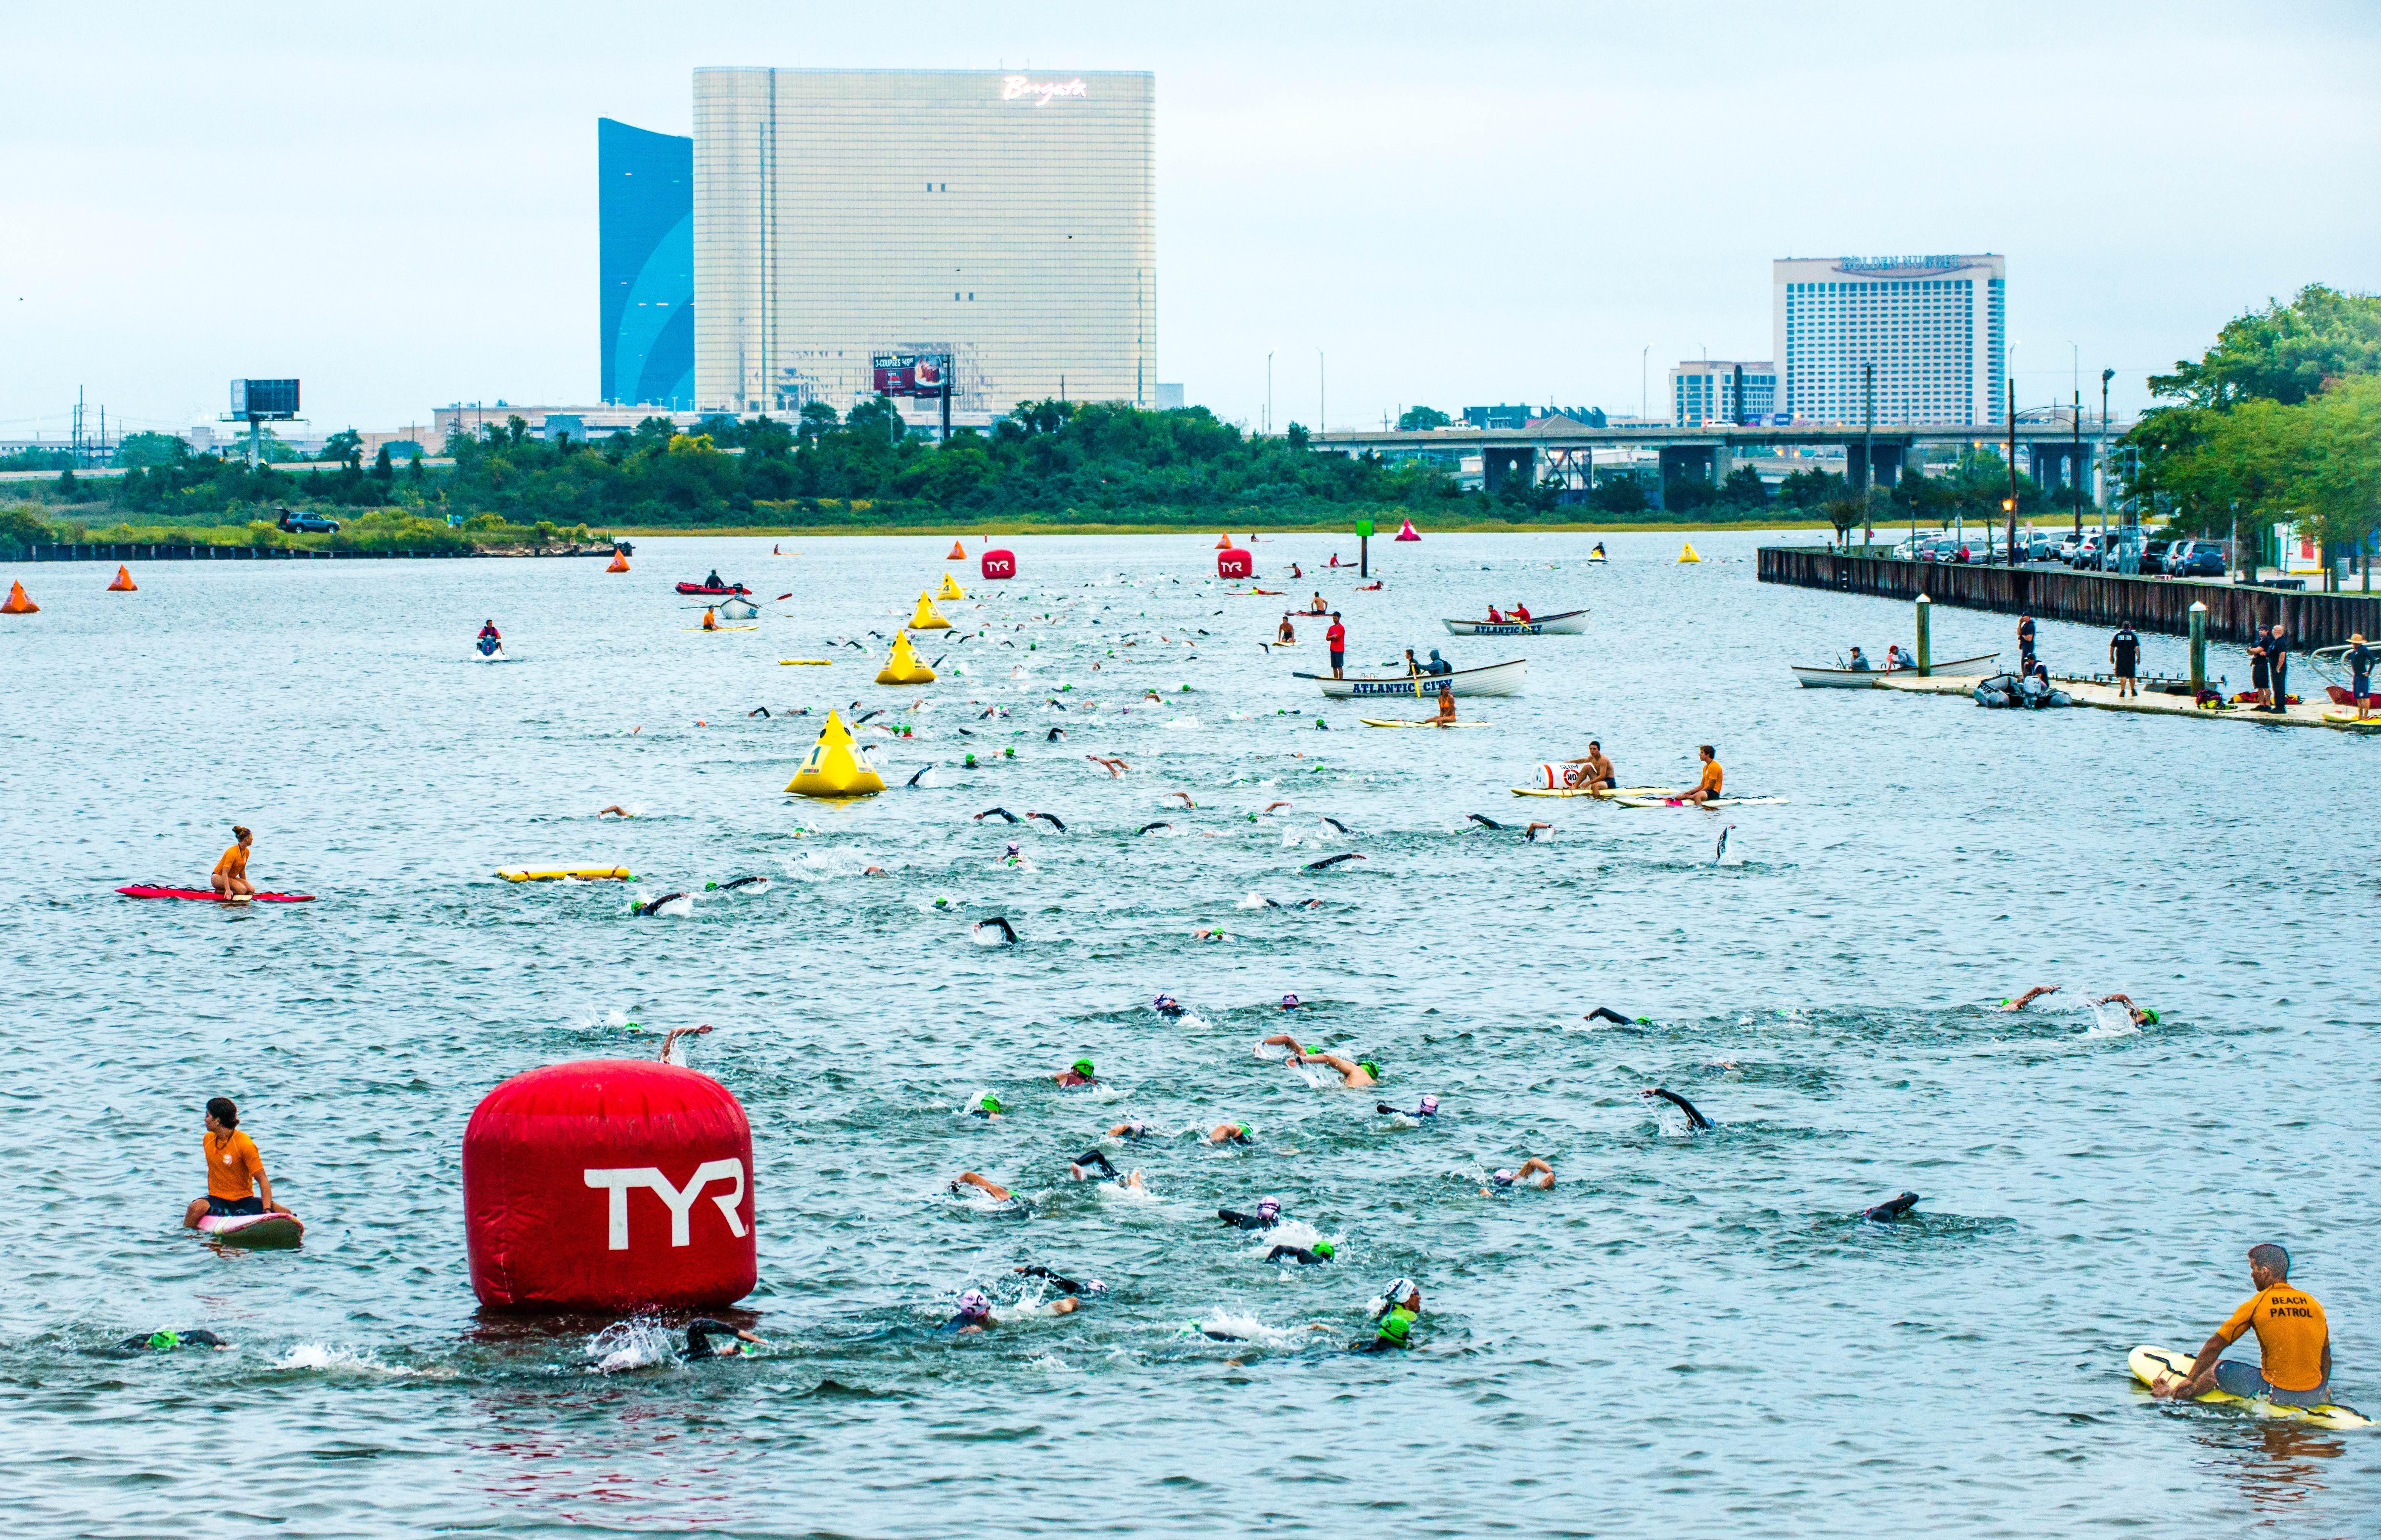 swim - Ironman 70.3 Atlantic City